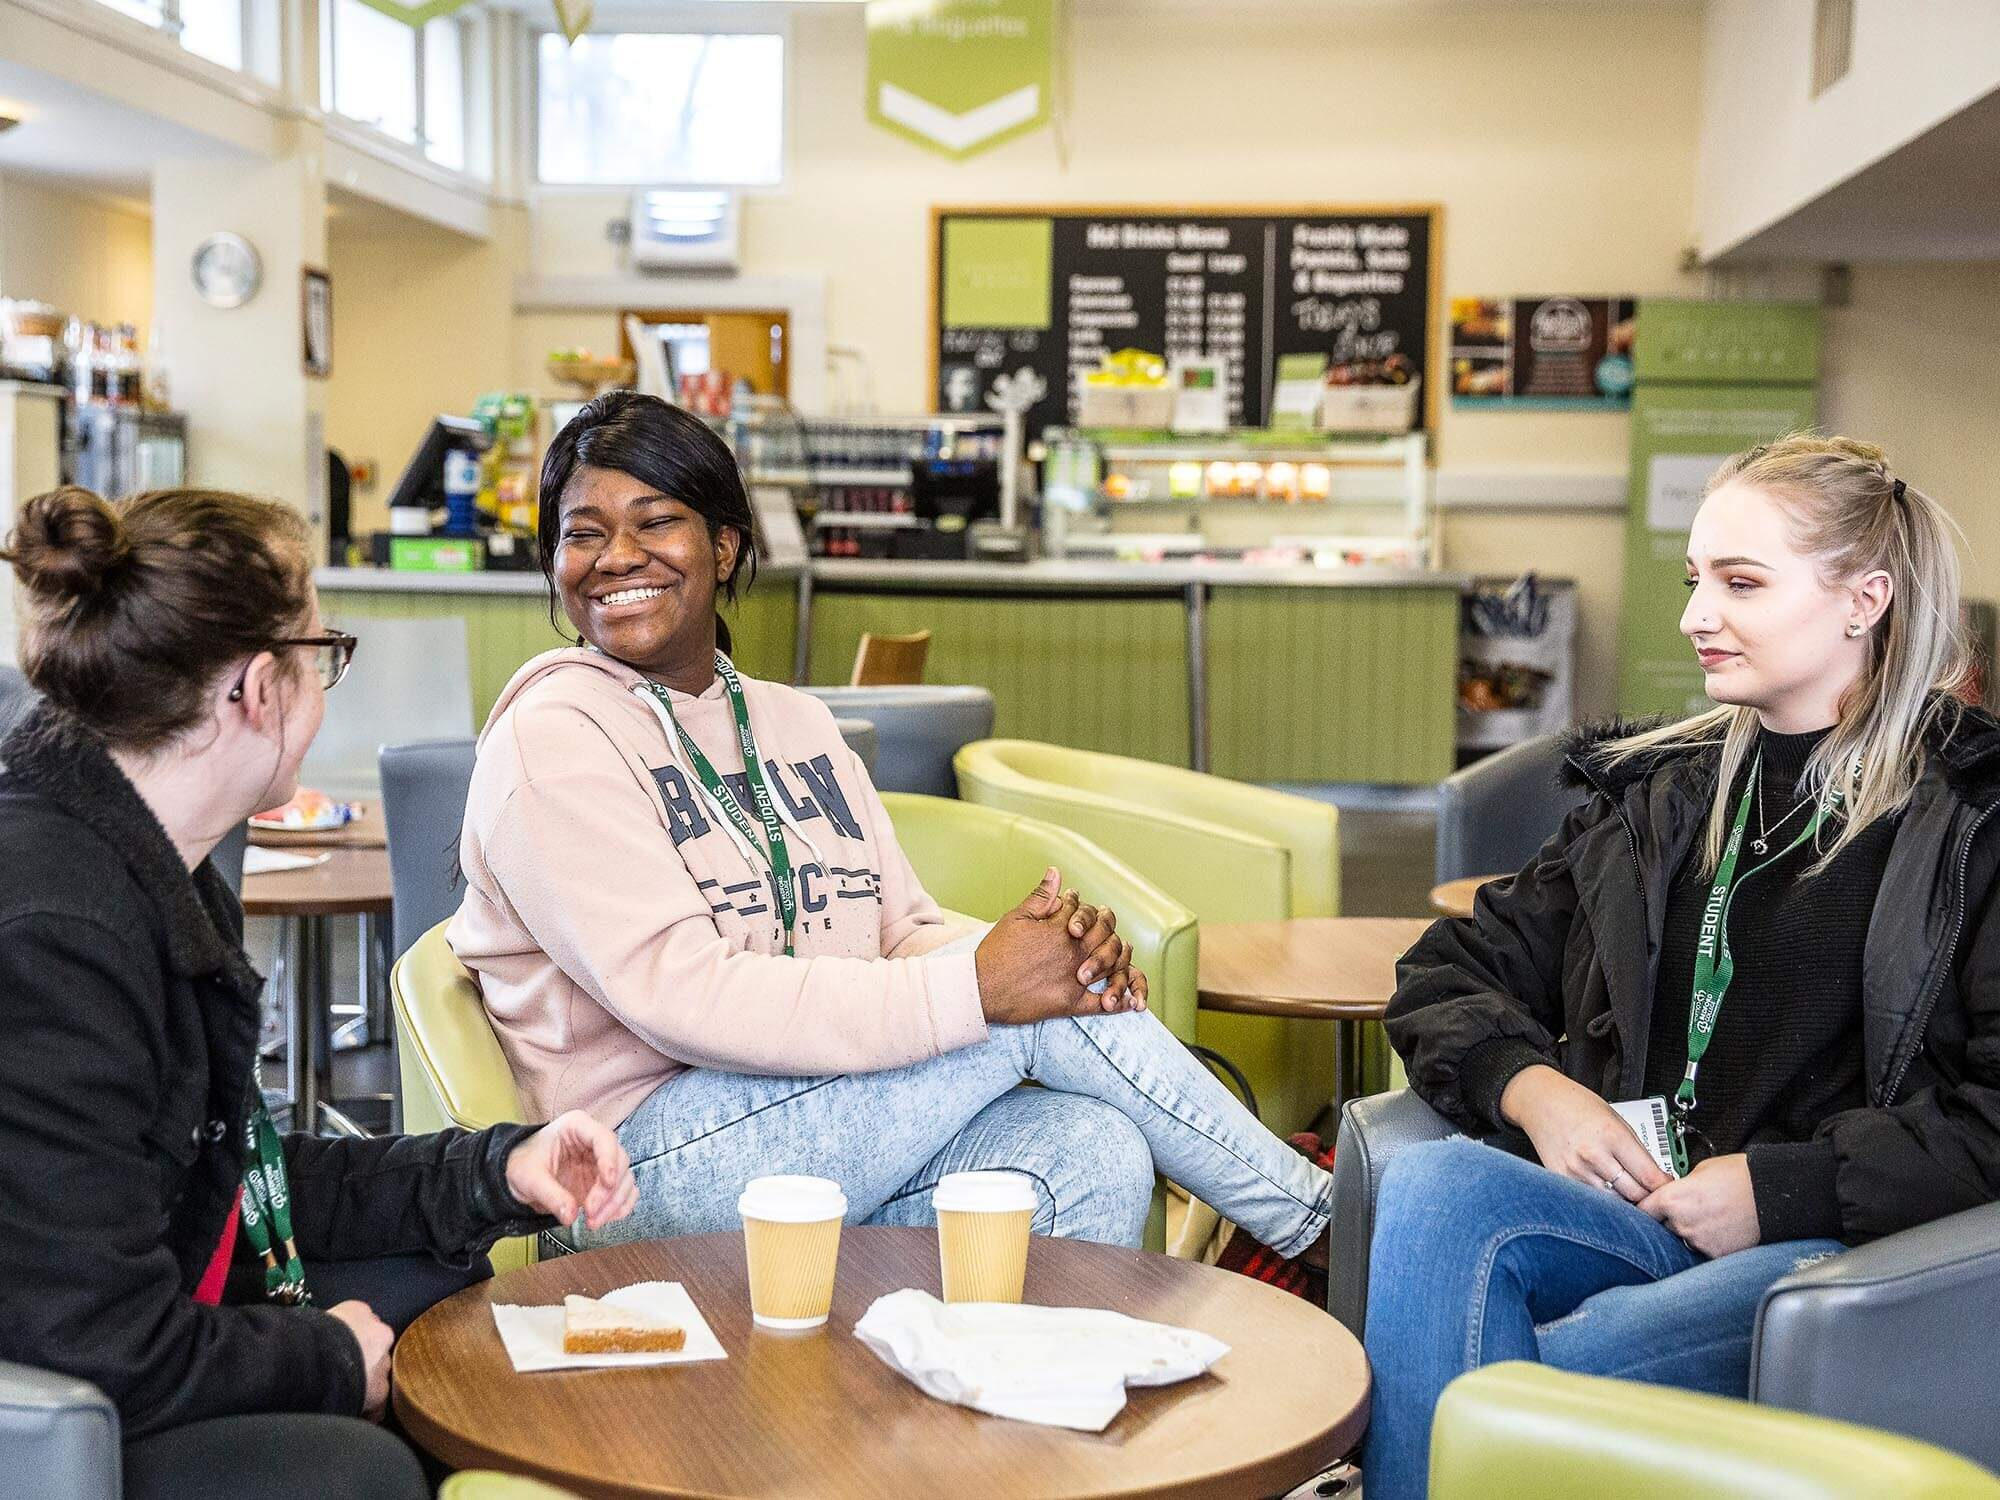 Cauldwell Campus students